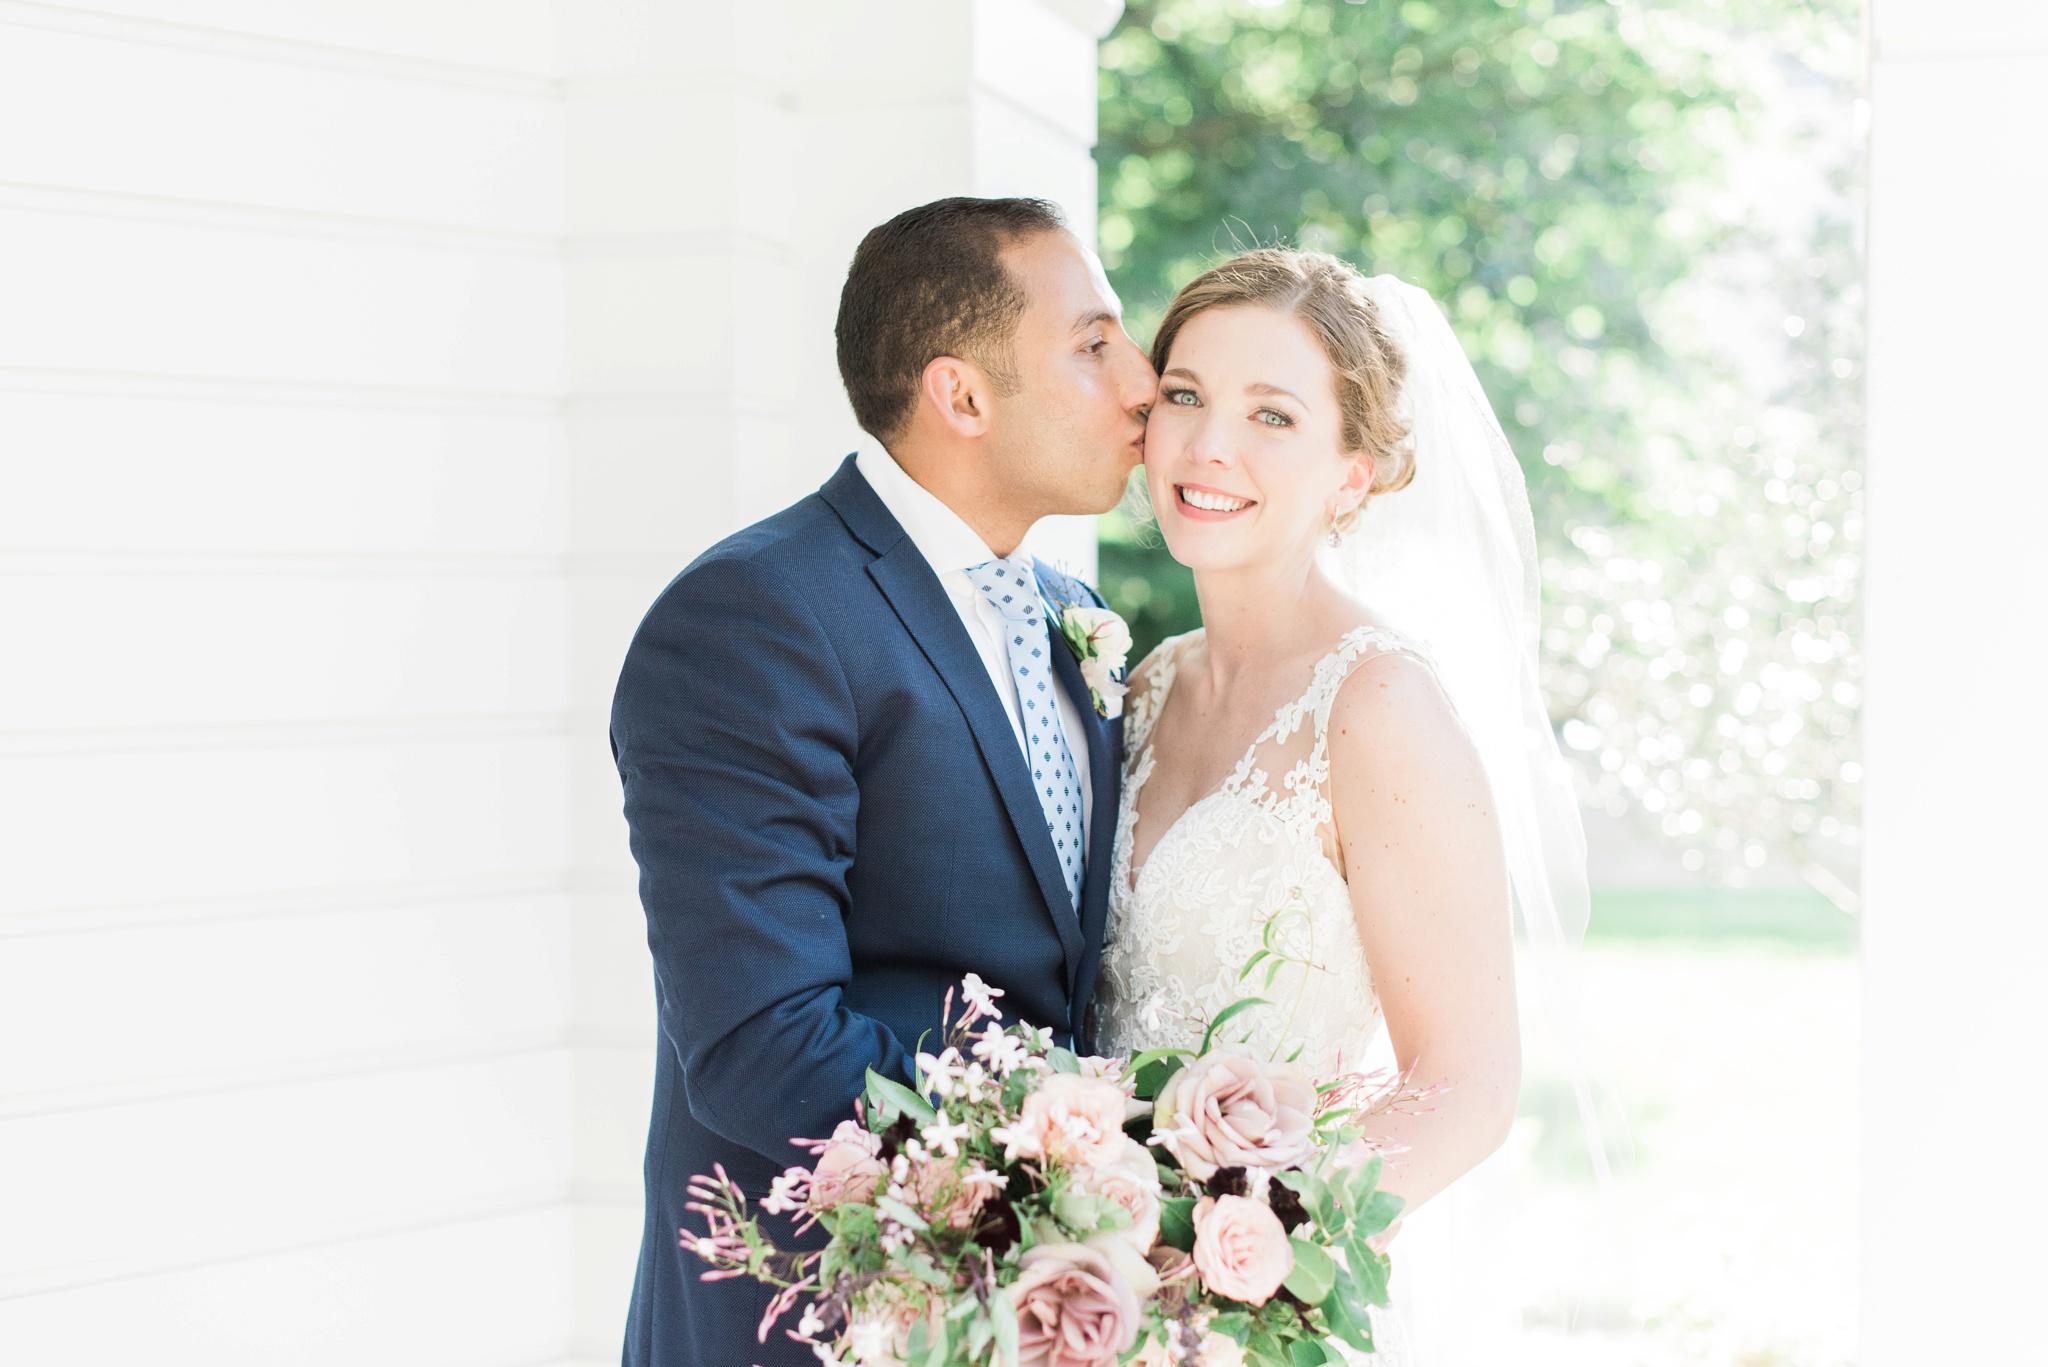 granville-inn-wedding-columbus-ohio-photographer_0067.jpg